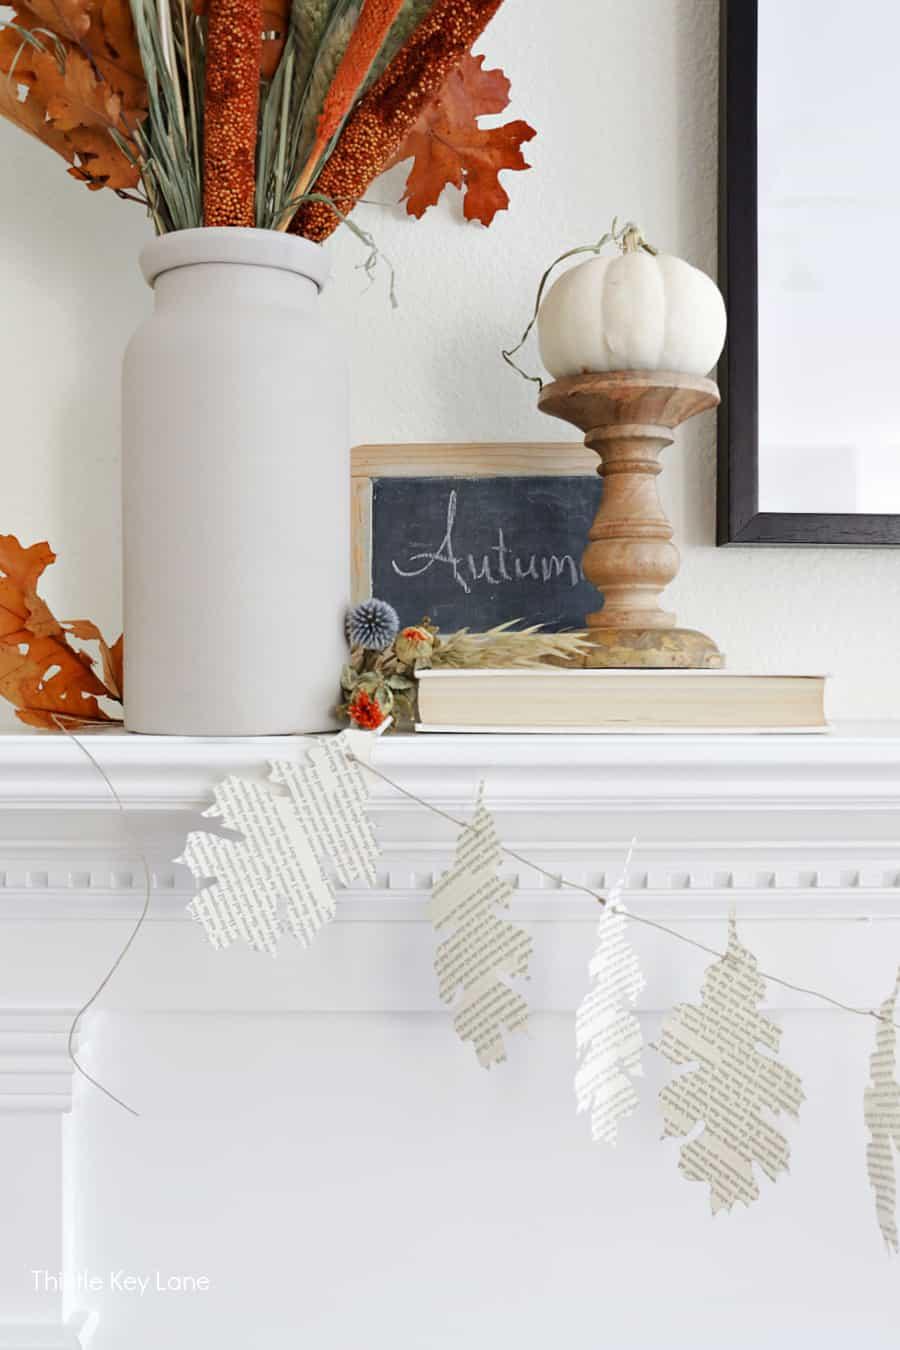 Autumn slate board, candle stick with pumpkin, leaf garland. DIY Book Page Leaf Garland.